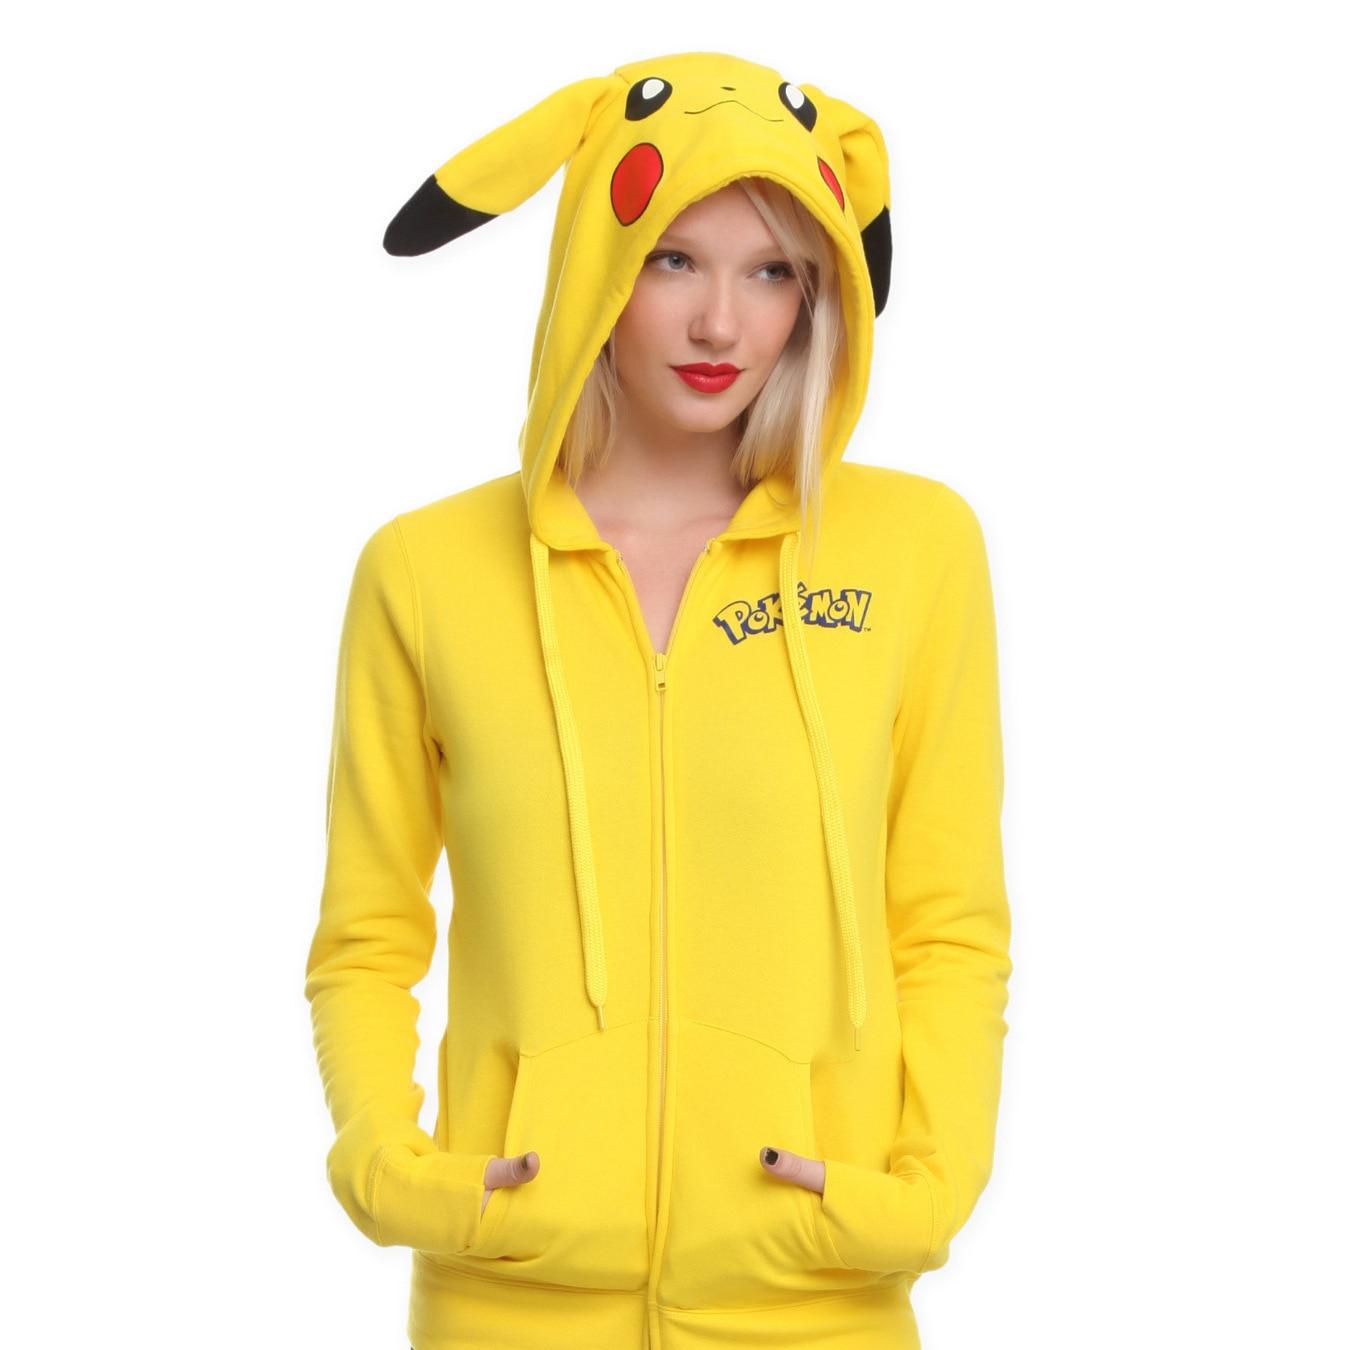 2016 Hoodies Pokemon Sudaderas Mujer New Pokemon Face Pikachu Totoro Printing Costume Tail Zip Hoodie Sweatshirt Free Shipping